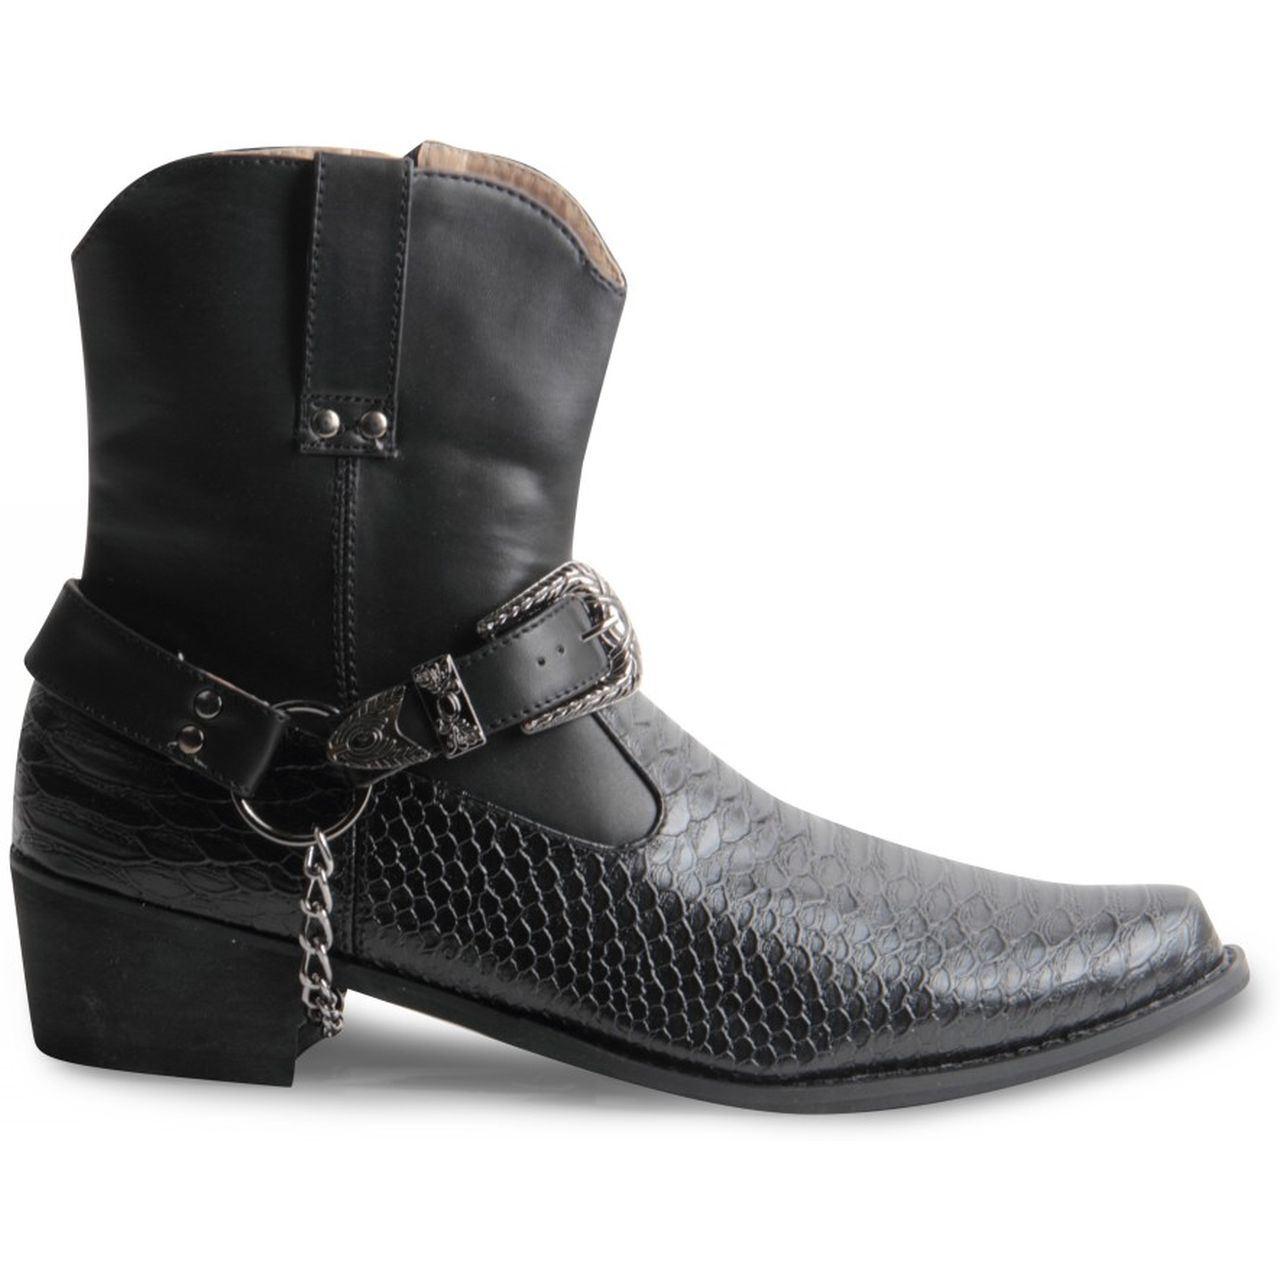 mens gents cowboy boots western snake skin ankle riding shoes black brown white ebay. Black Bedroom Furniture Sets. Home Design Ideas